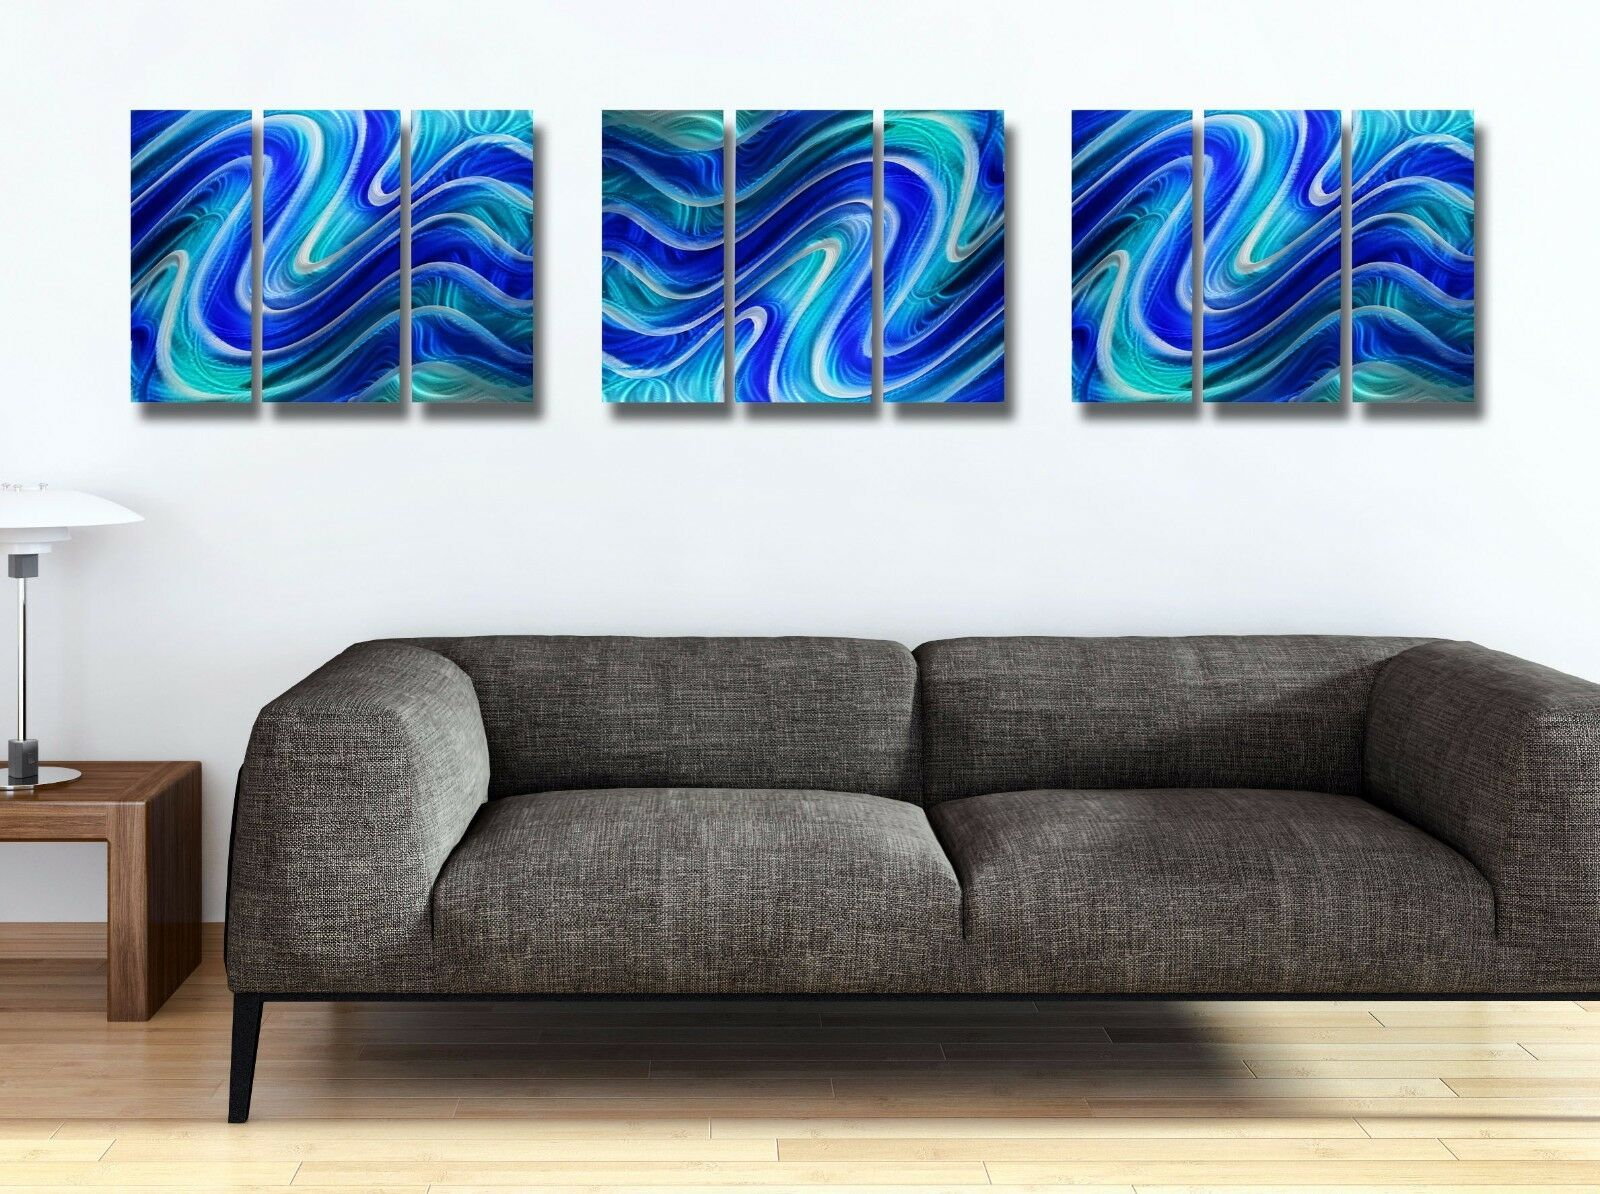 Statements2000 Metal Wall Art Panels Xl Abstract Aqua Blue Water Decor Jon Allen Blue Metal Art Ideas With Images Metal Wall Art Panel Wall Art Metal Wall Art Panels